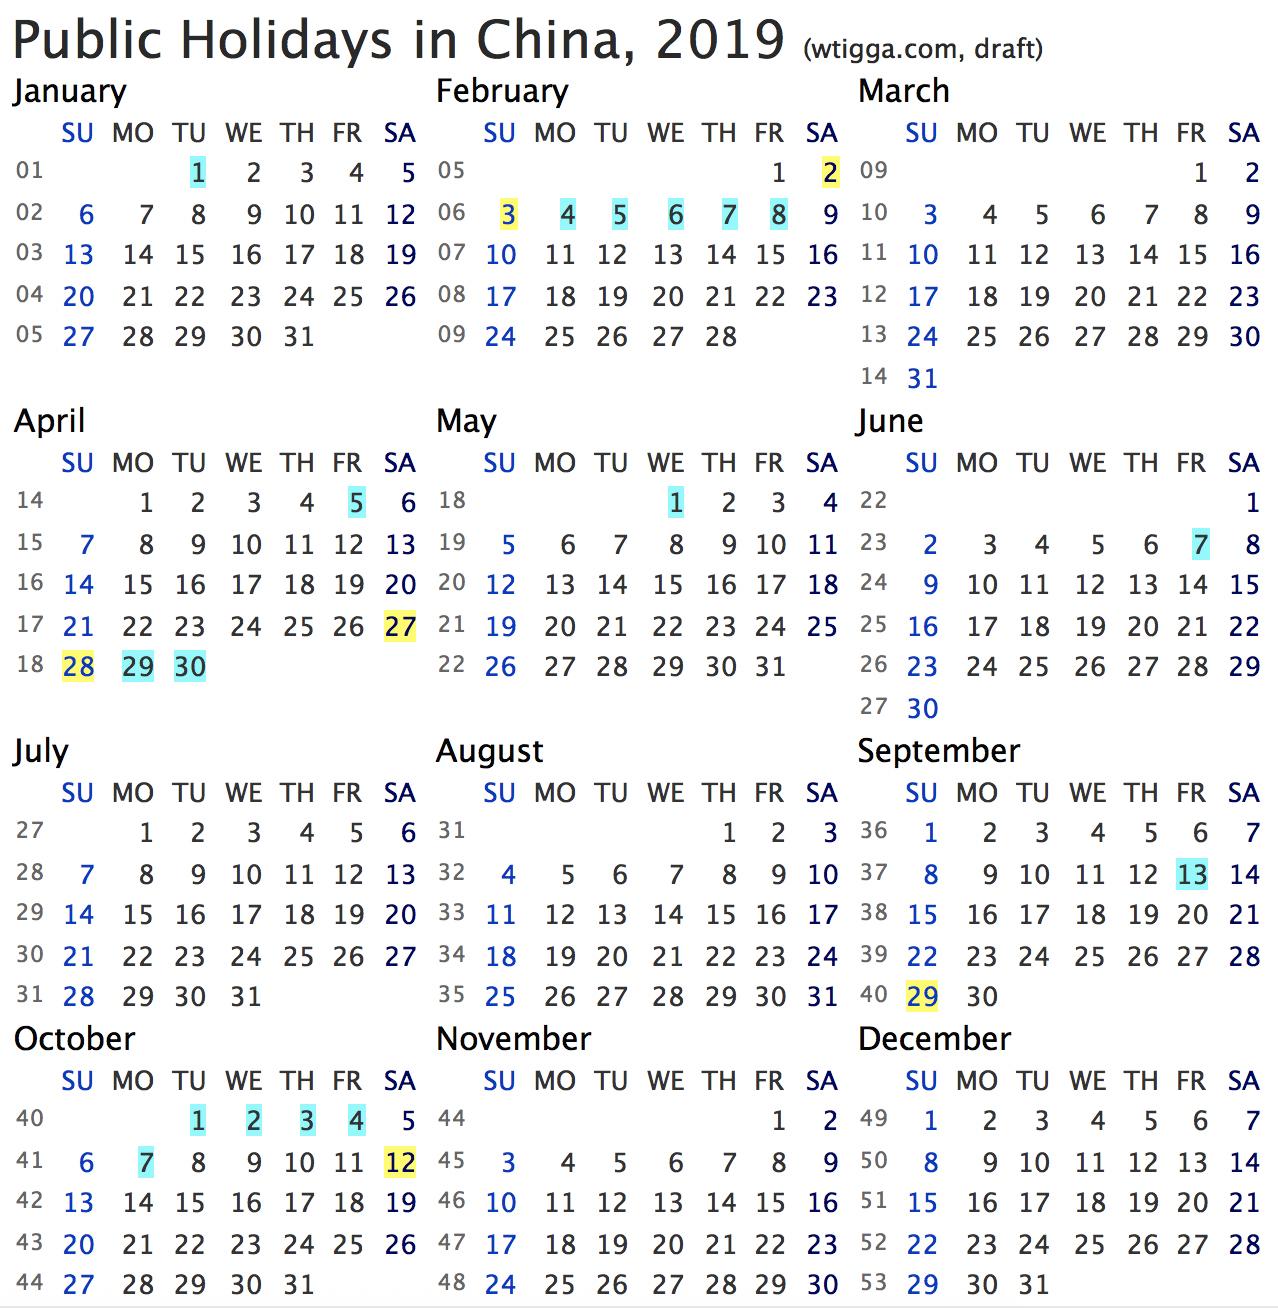 Public holidays in China, 2019 (wtigga.com/en)